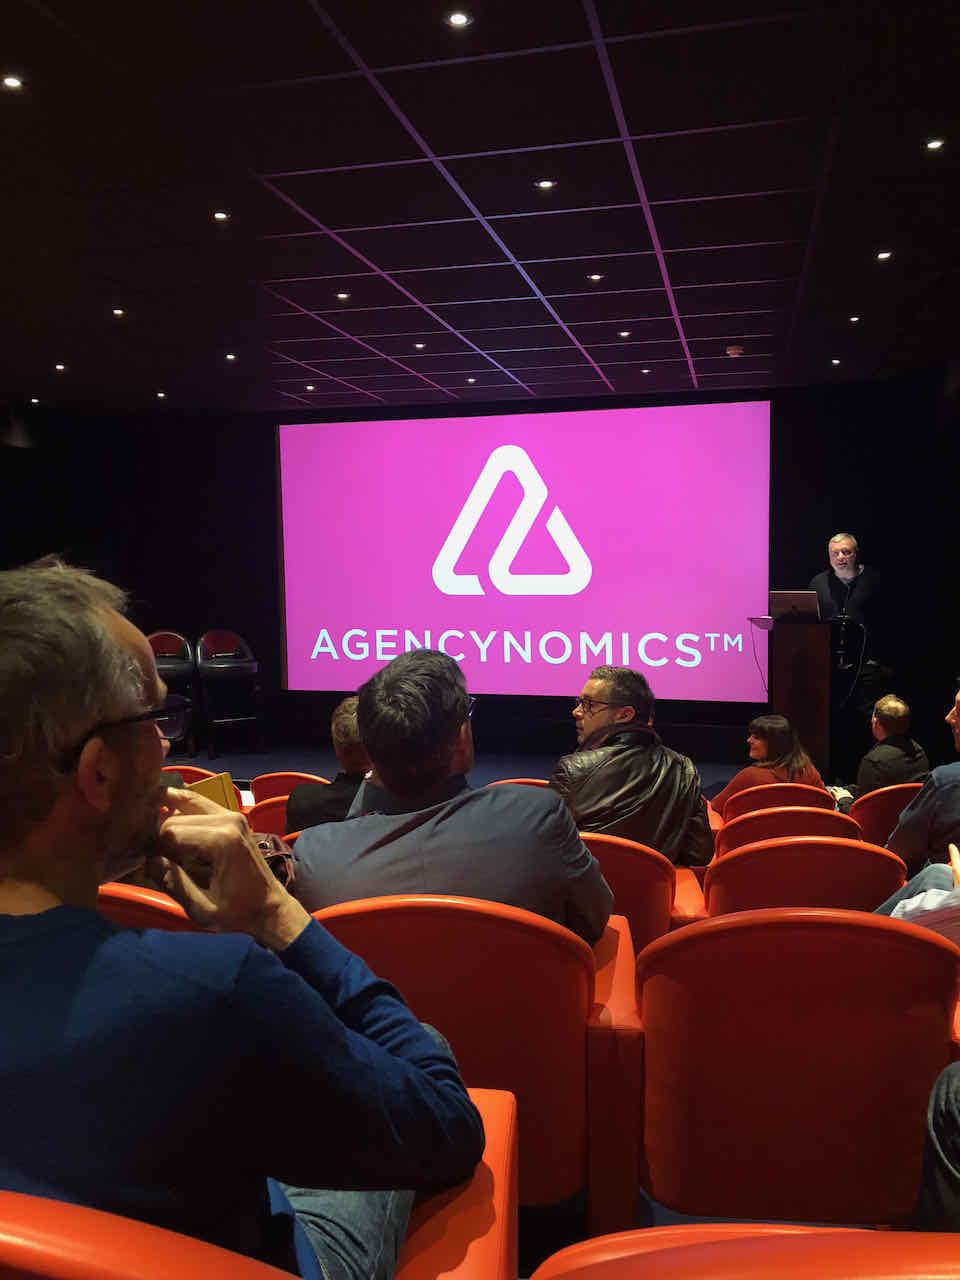 Agencynomics event